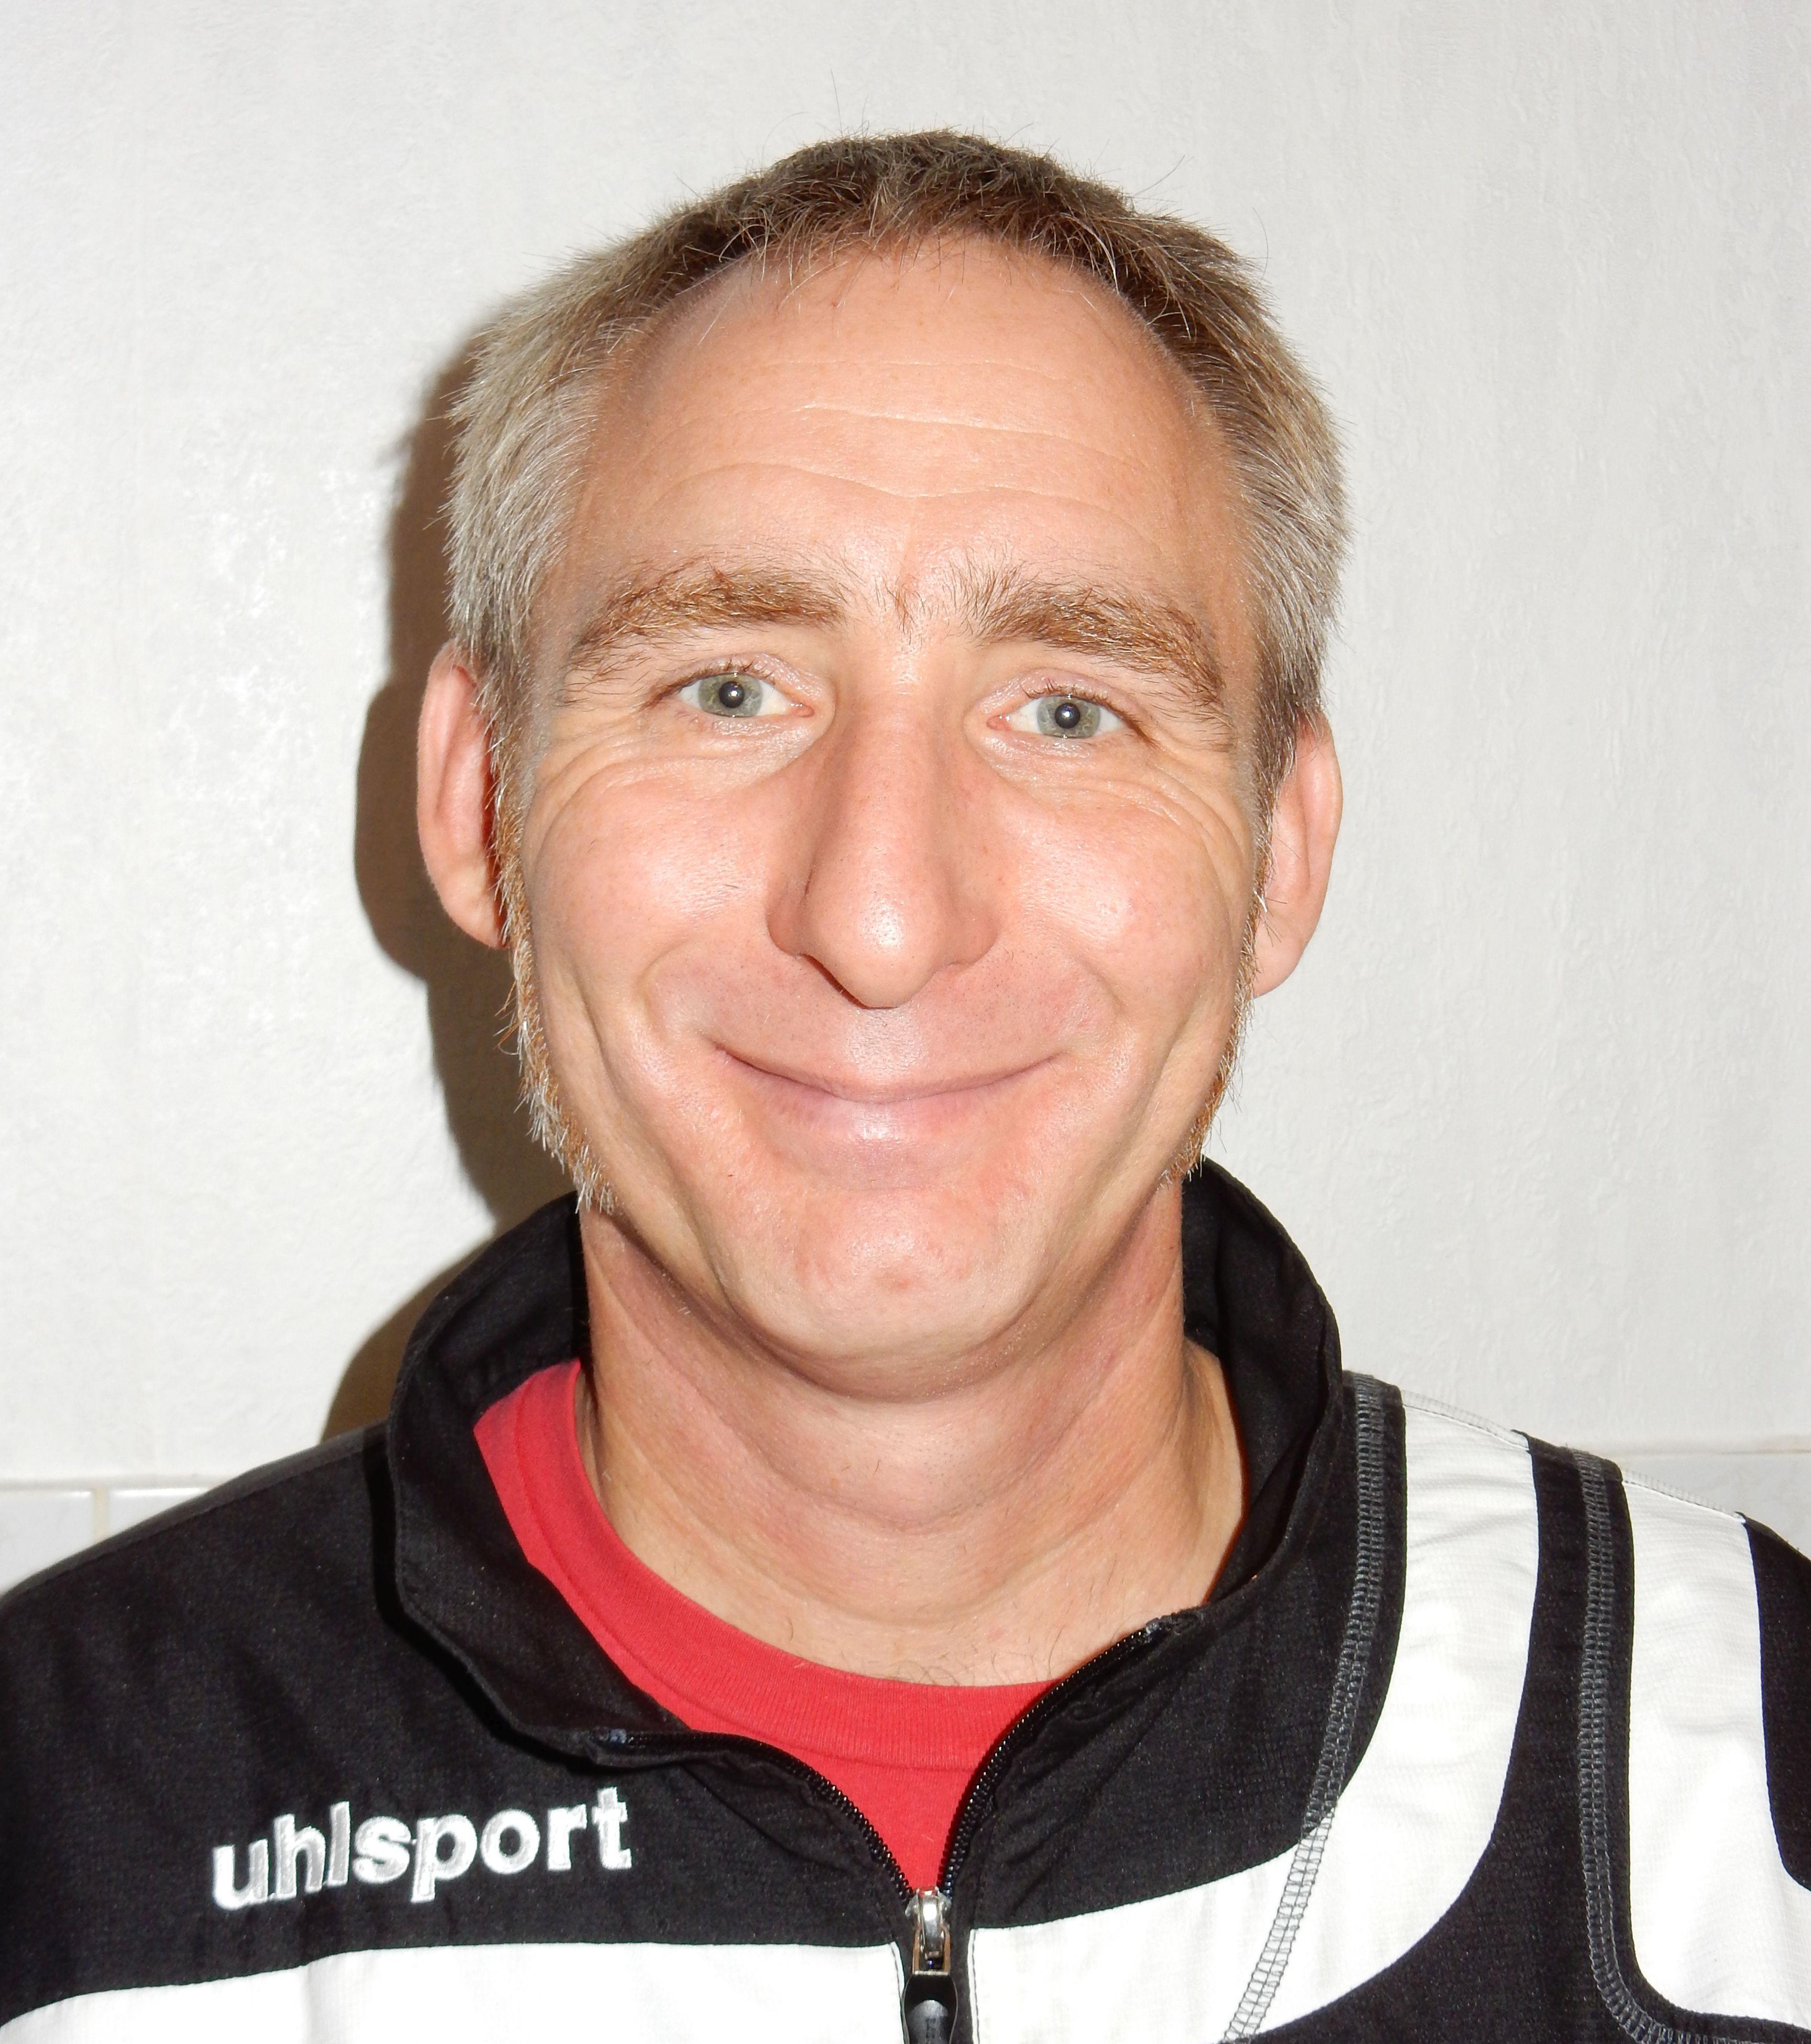 Michael Kuhnle